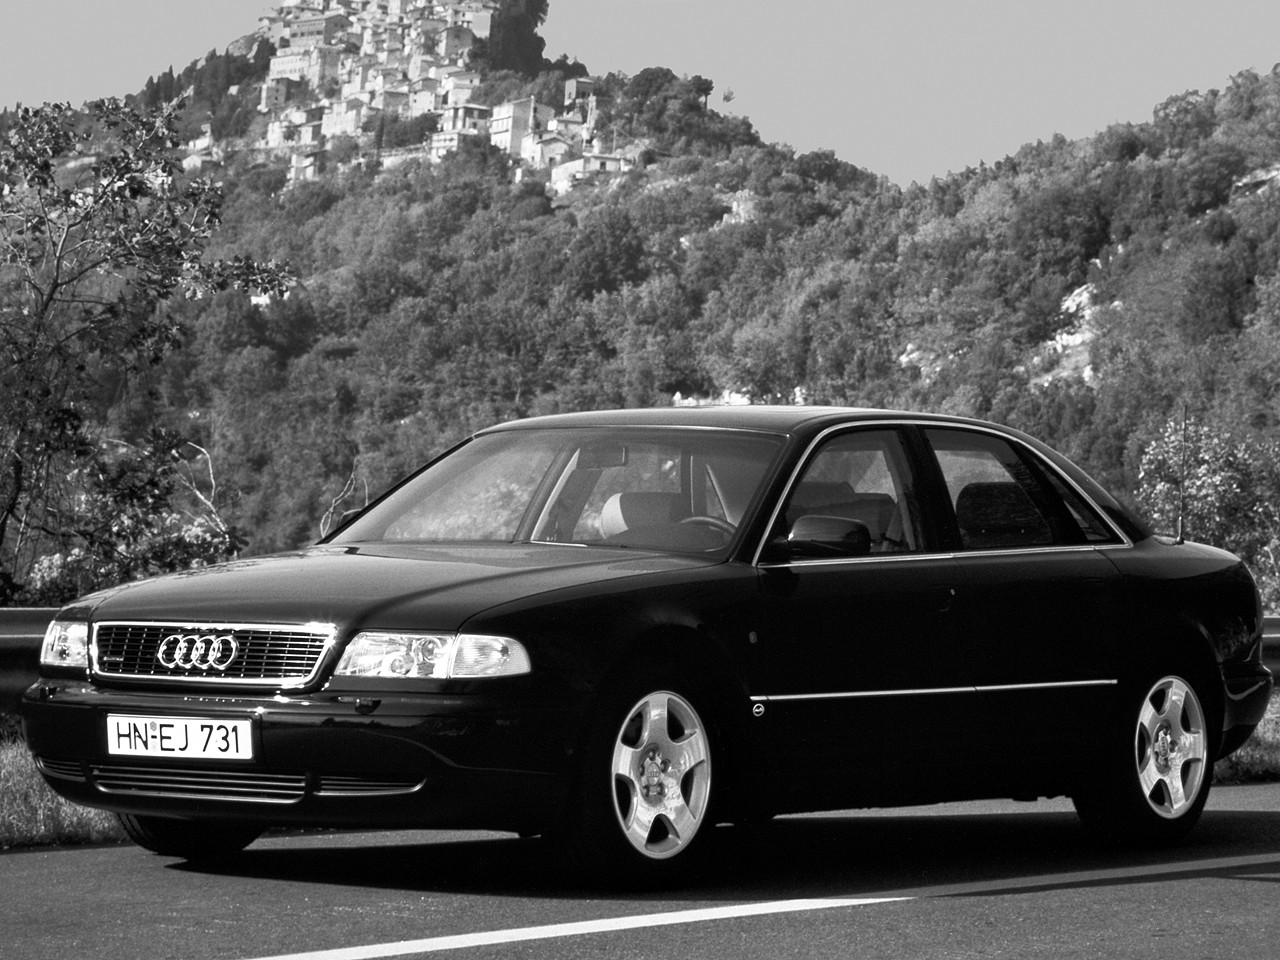 Audi A8 I (D2) 1994 - 1998 Sedan #6